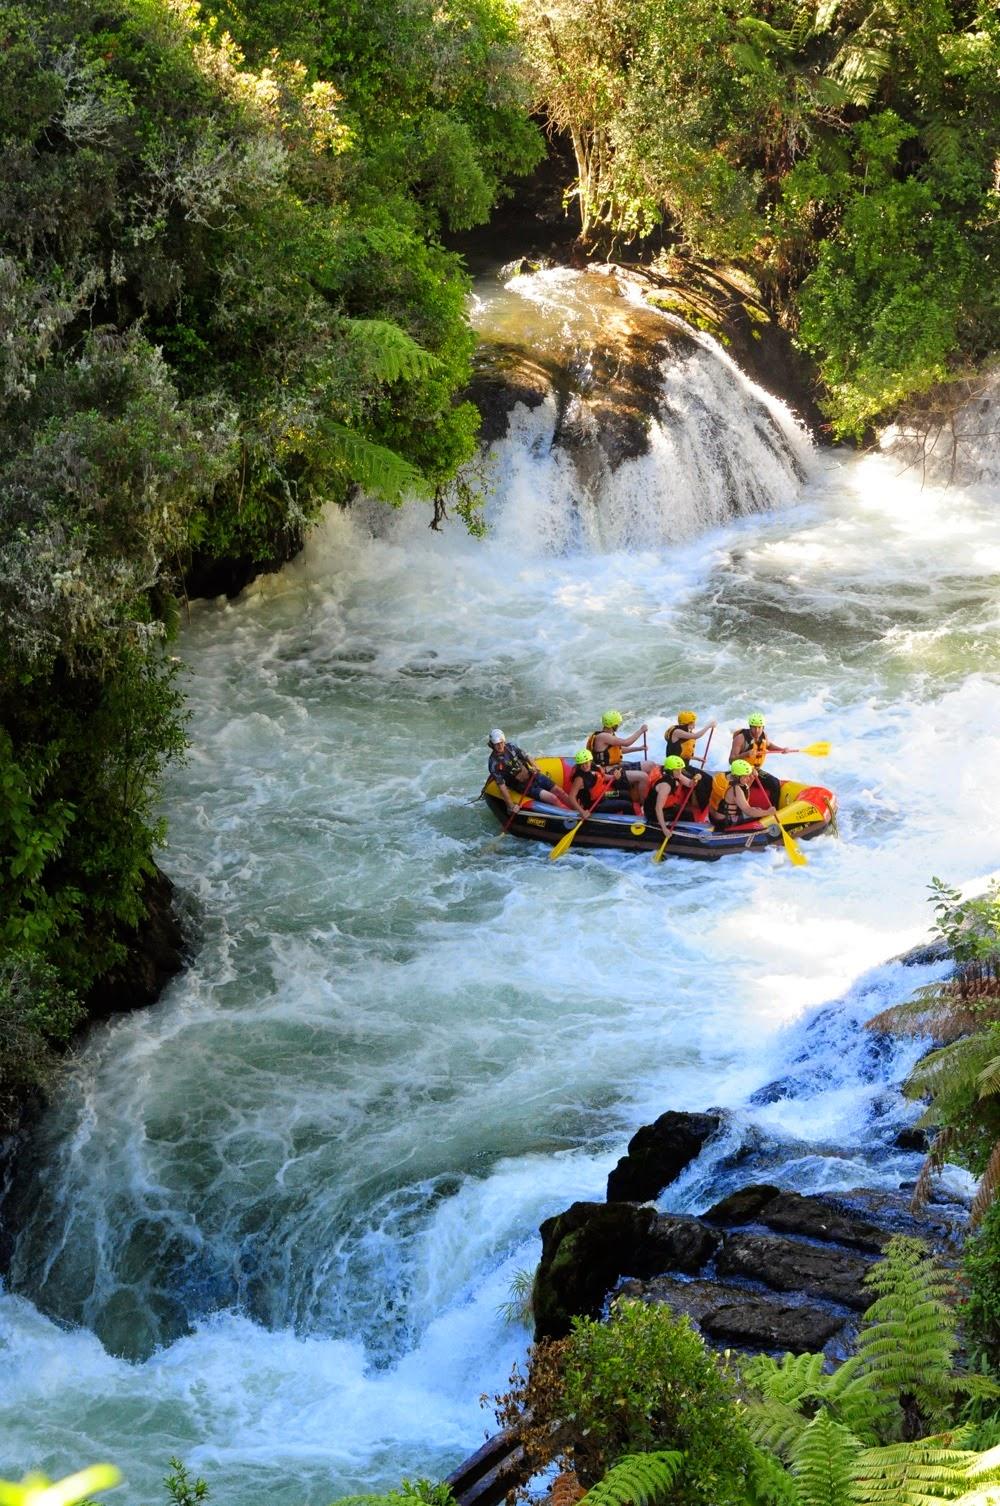 Stunning scenery on the Kaituna River